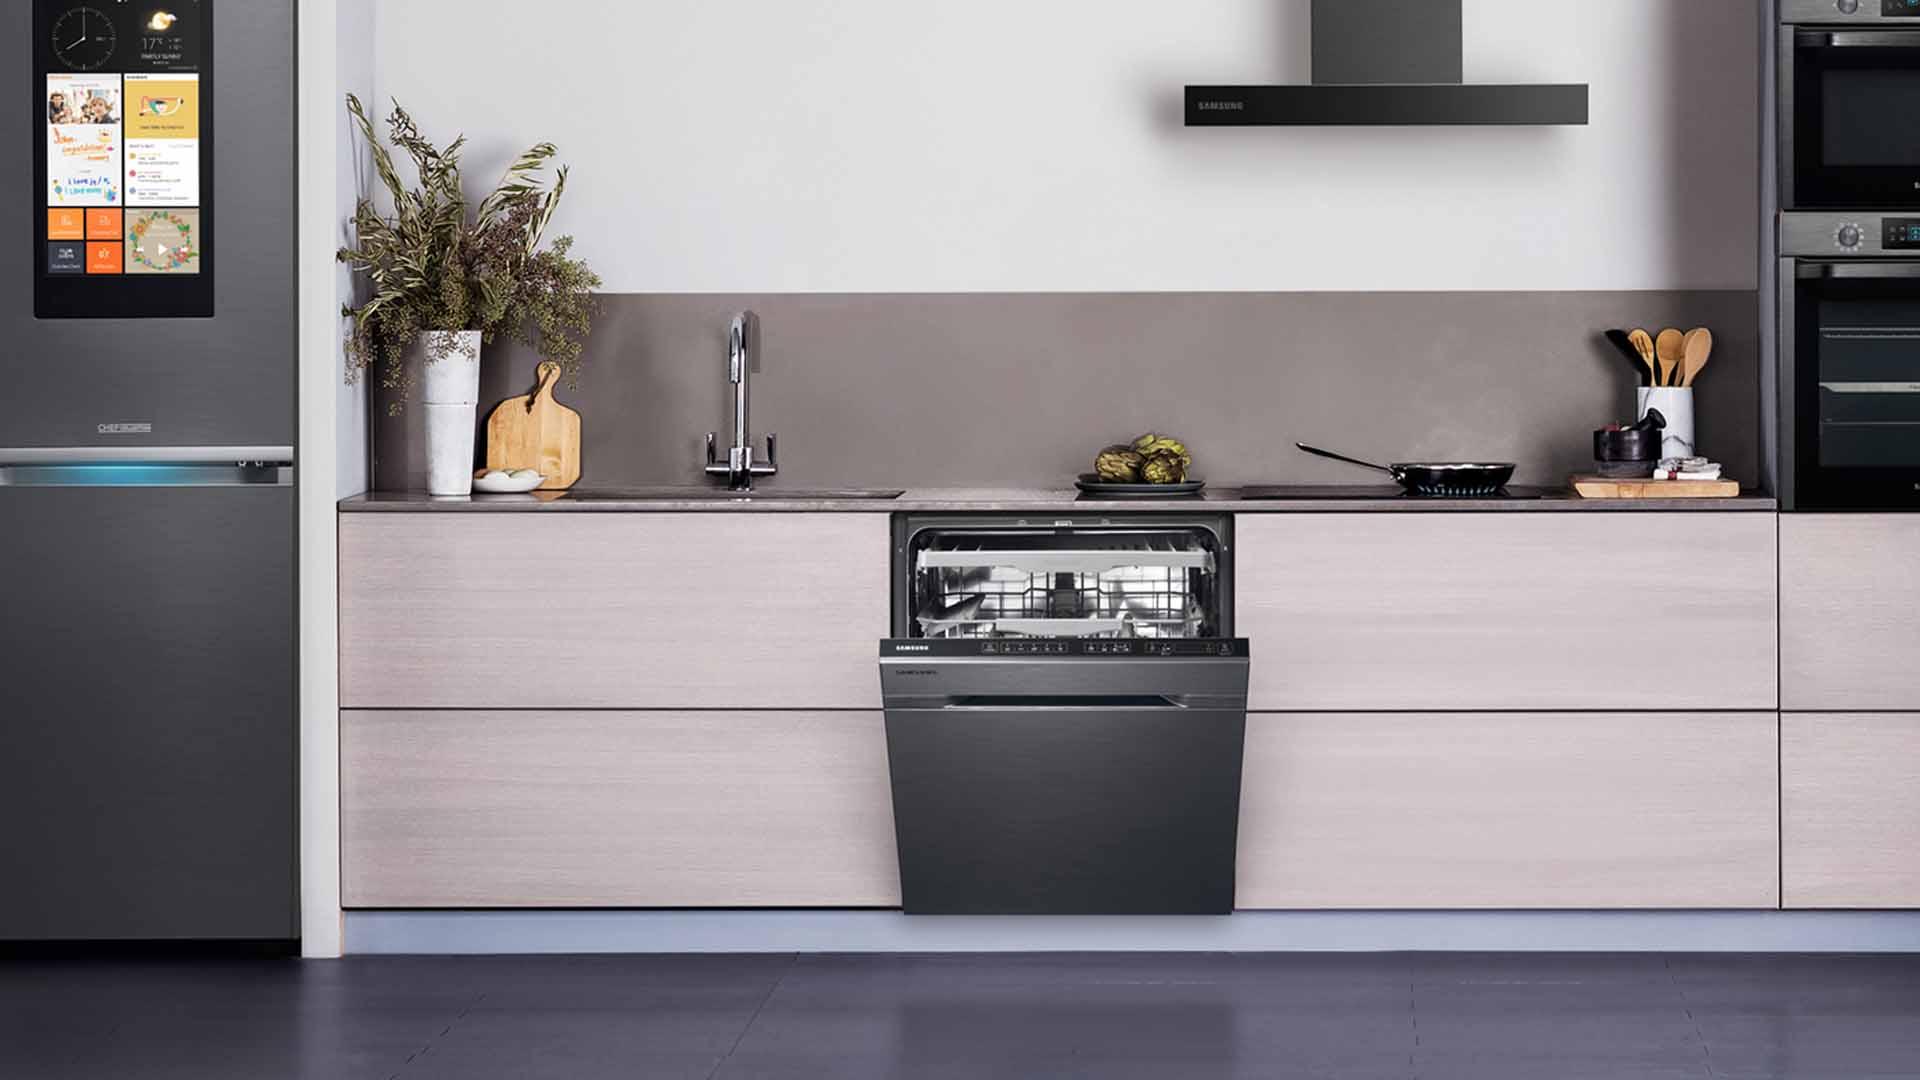 Samsung Dishwasher Repair | Samsung Appliance Repair